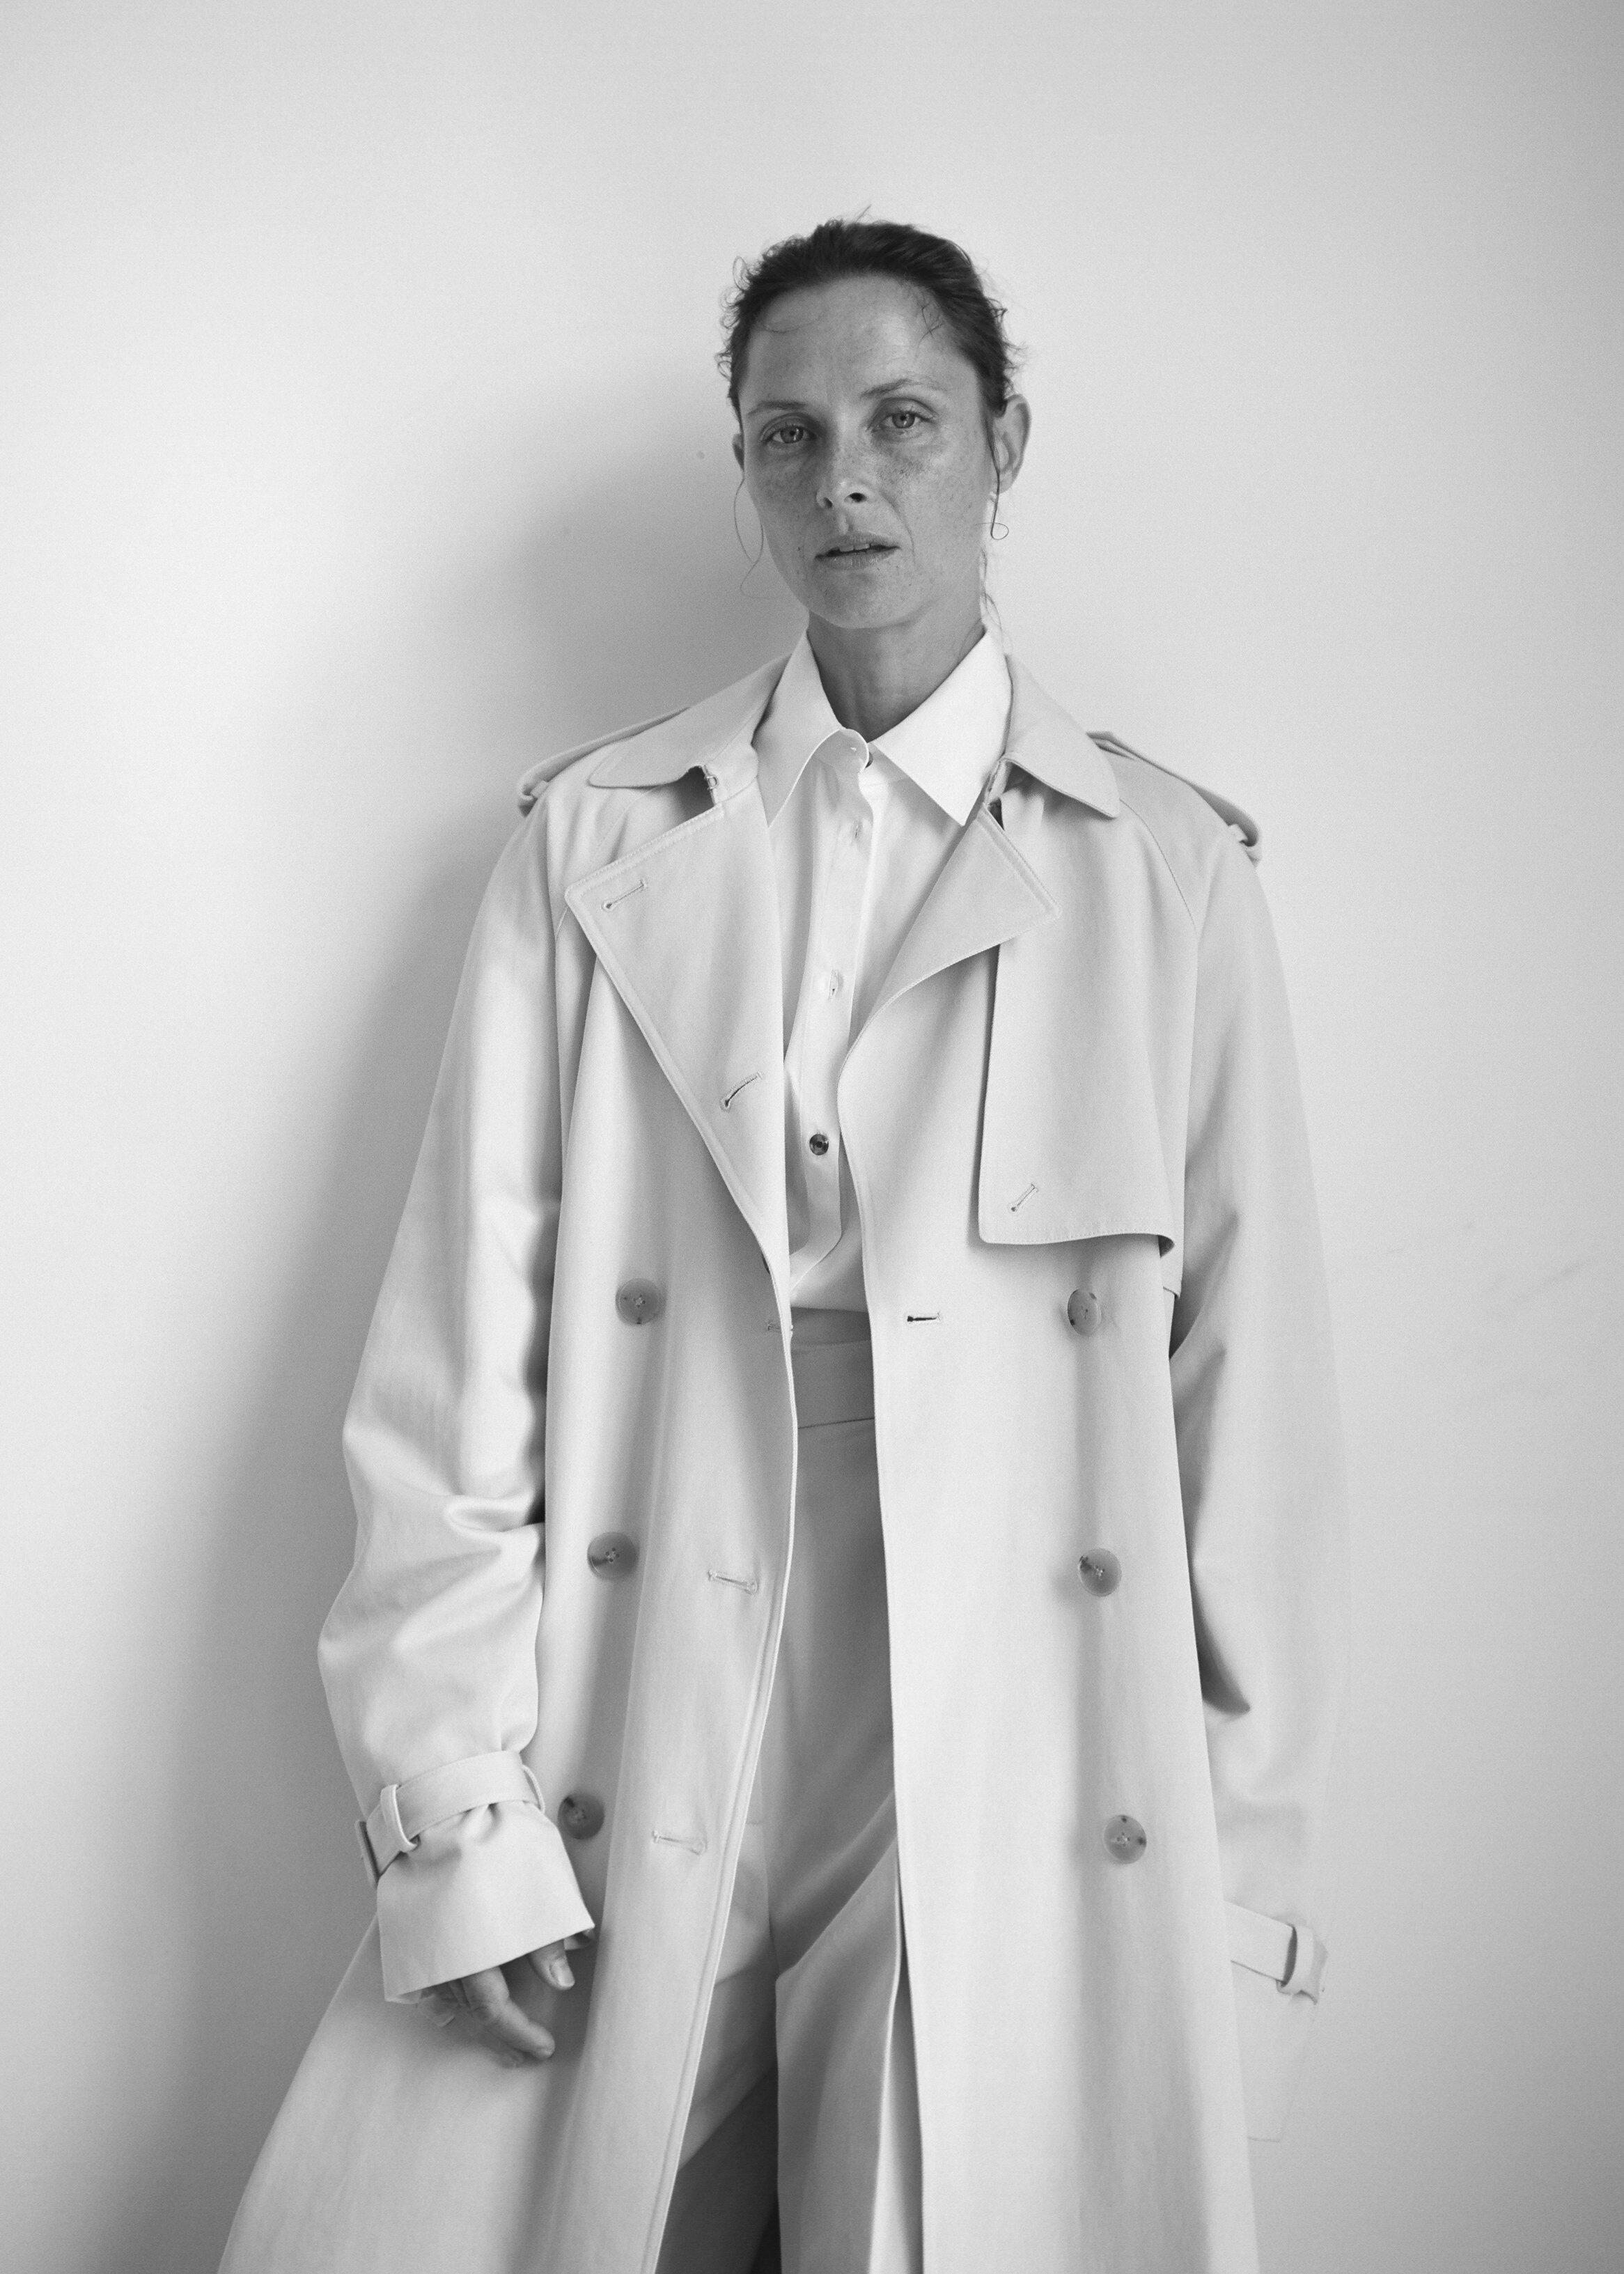 Tasha-Tilberg-Mark-Rabadan-Collection-Issue 2.jpg